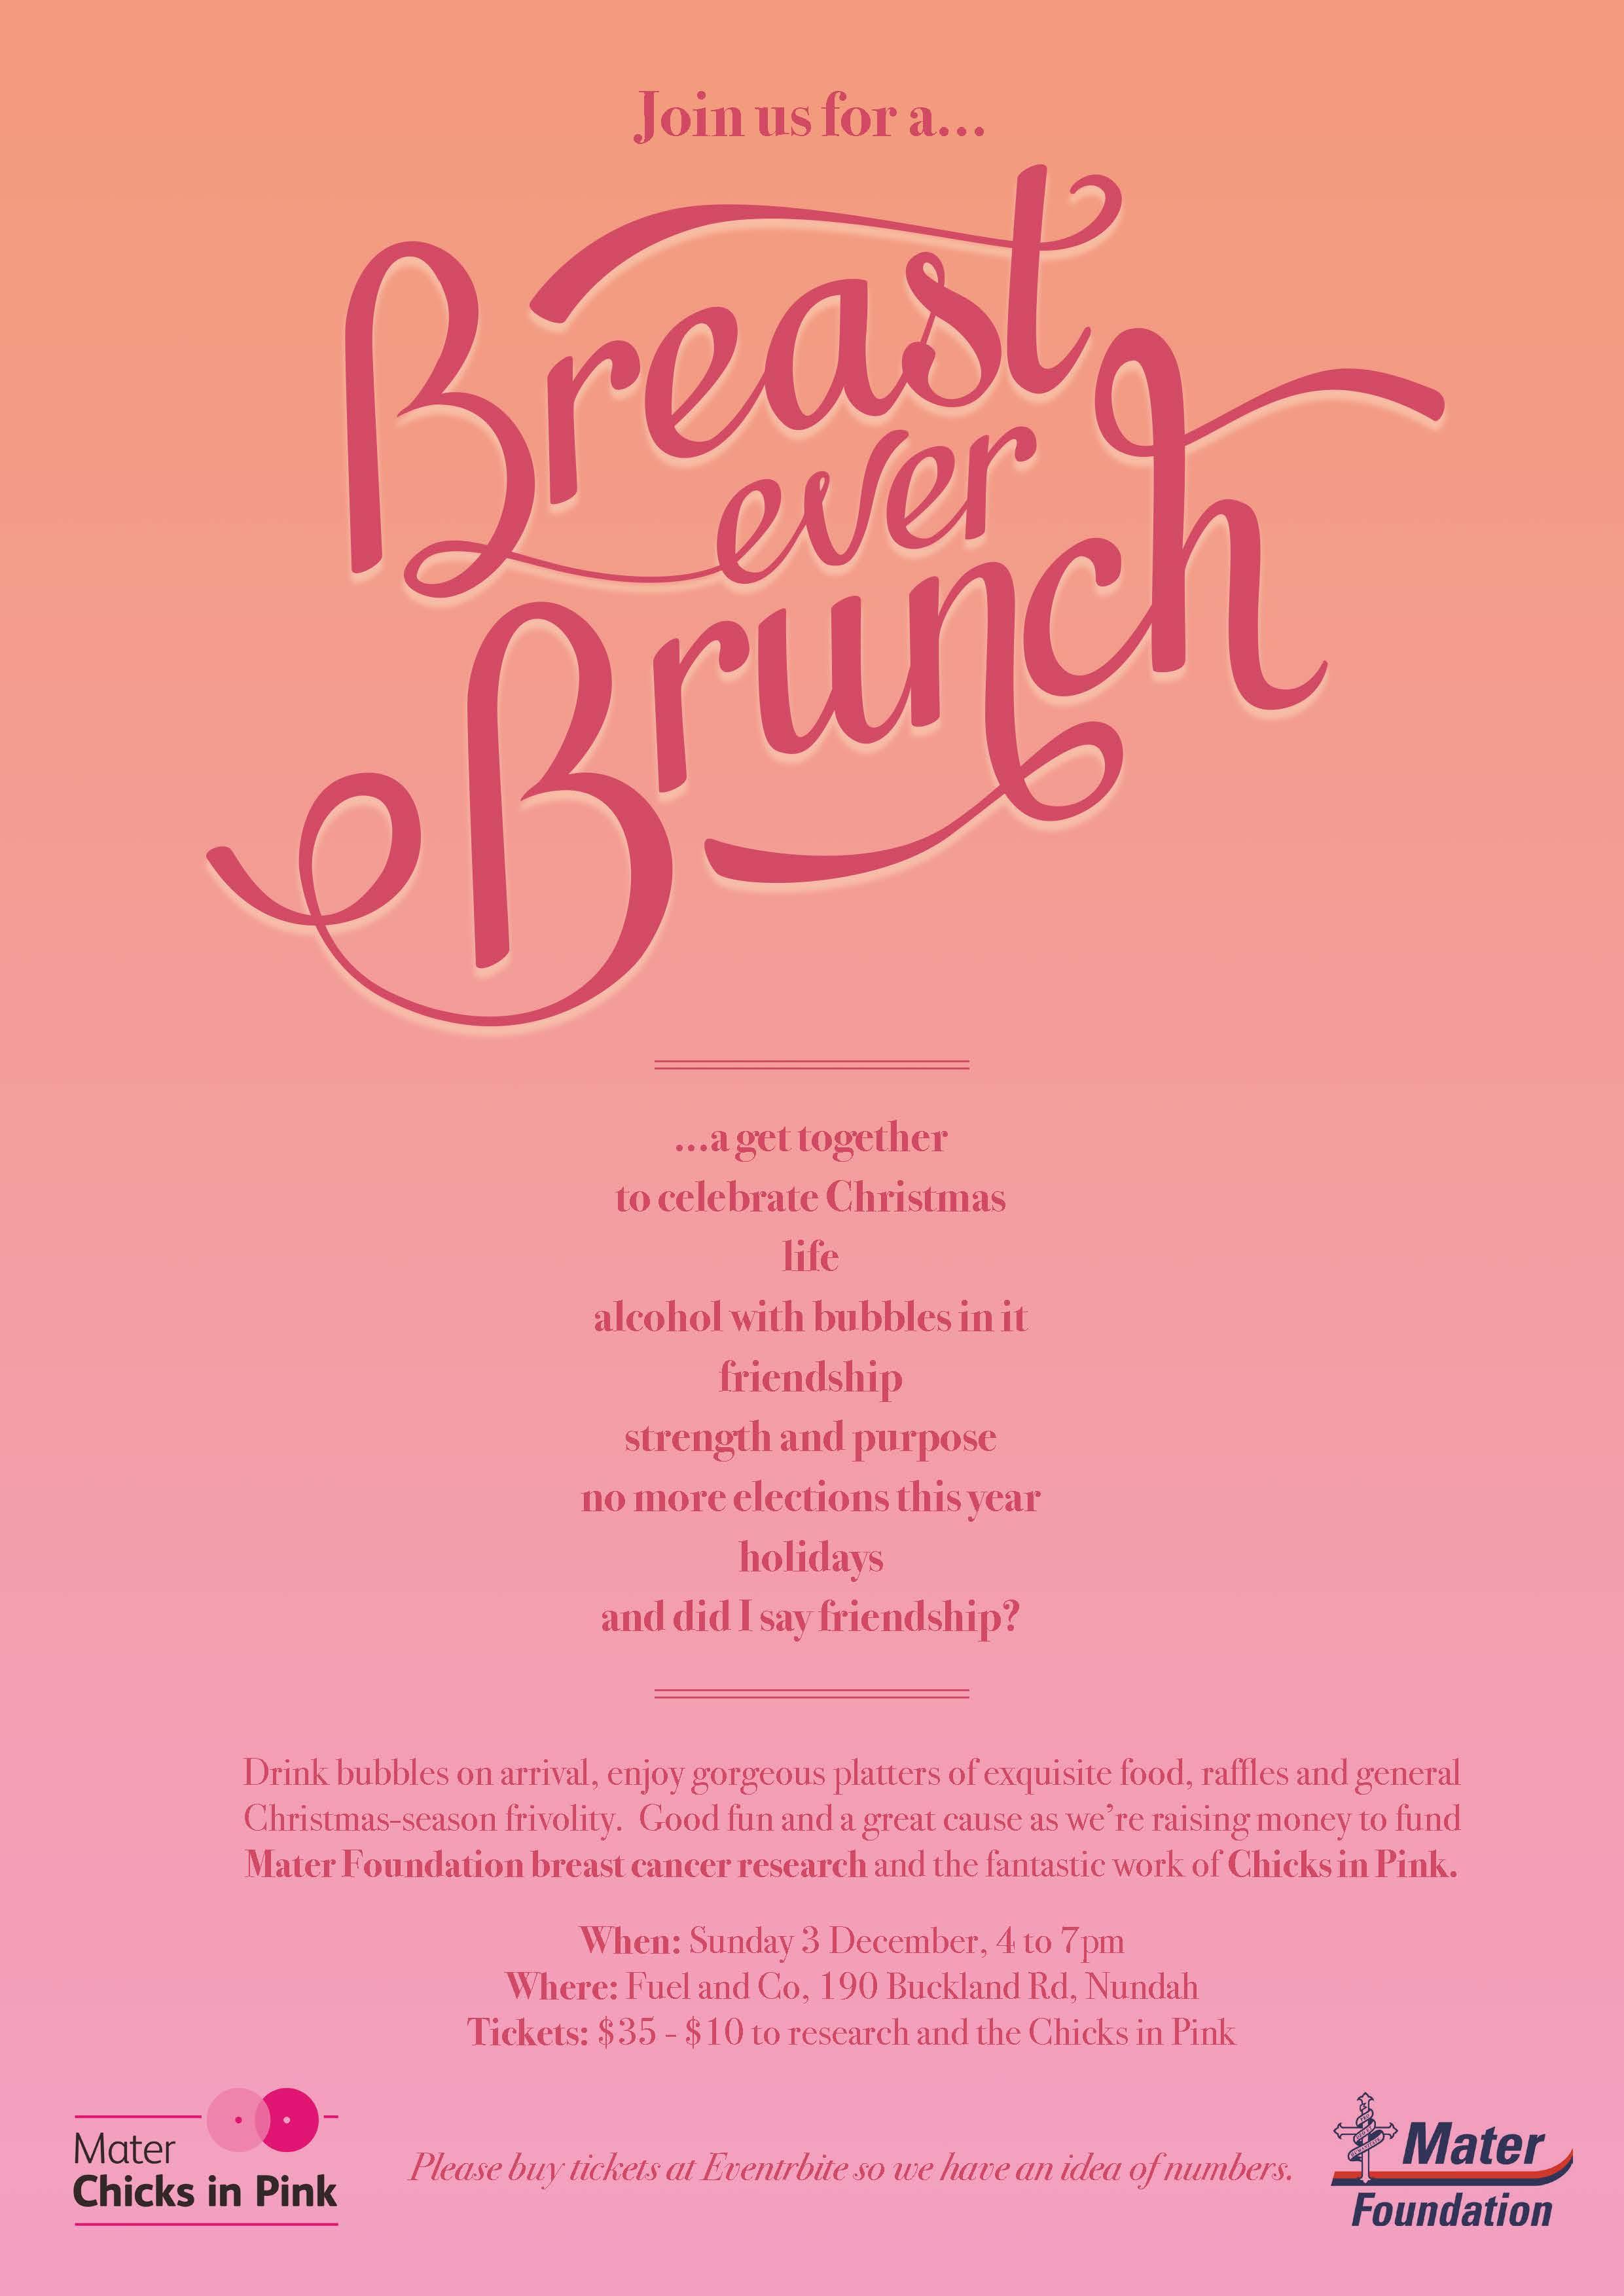 Breast Brunch Ever